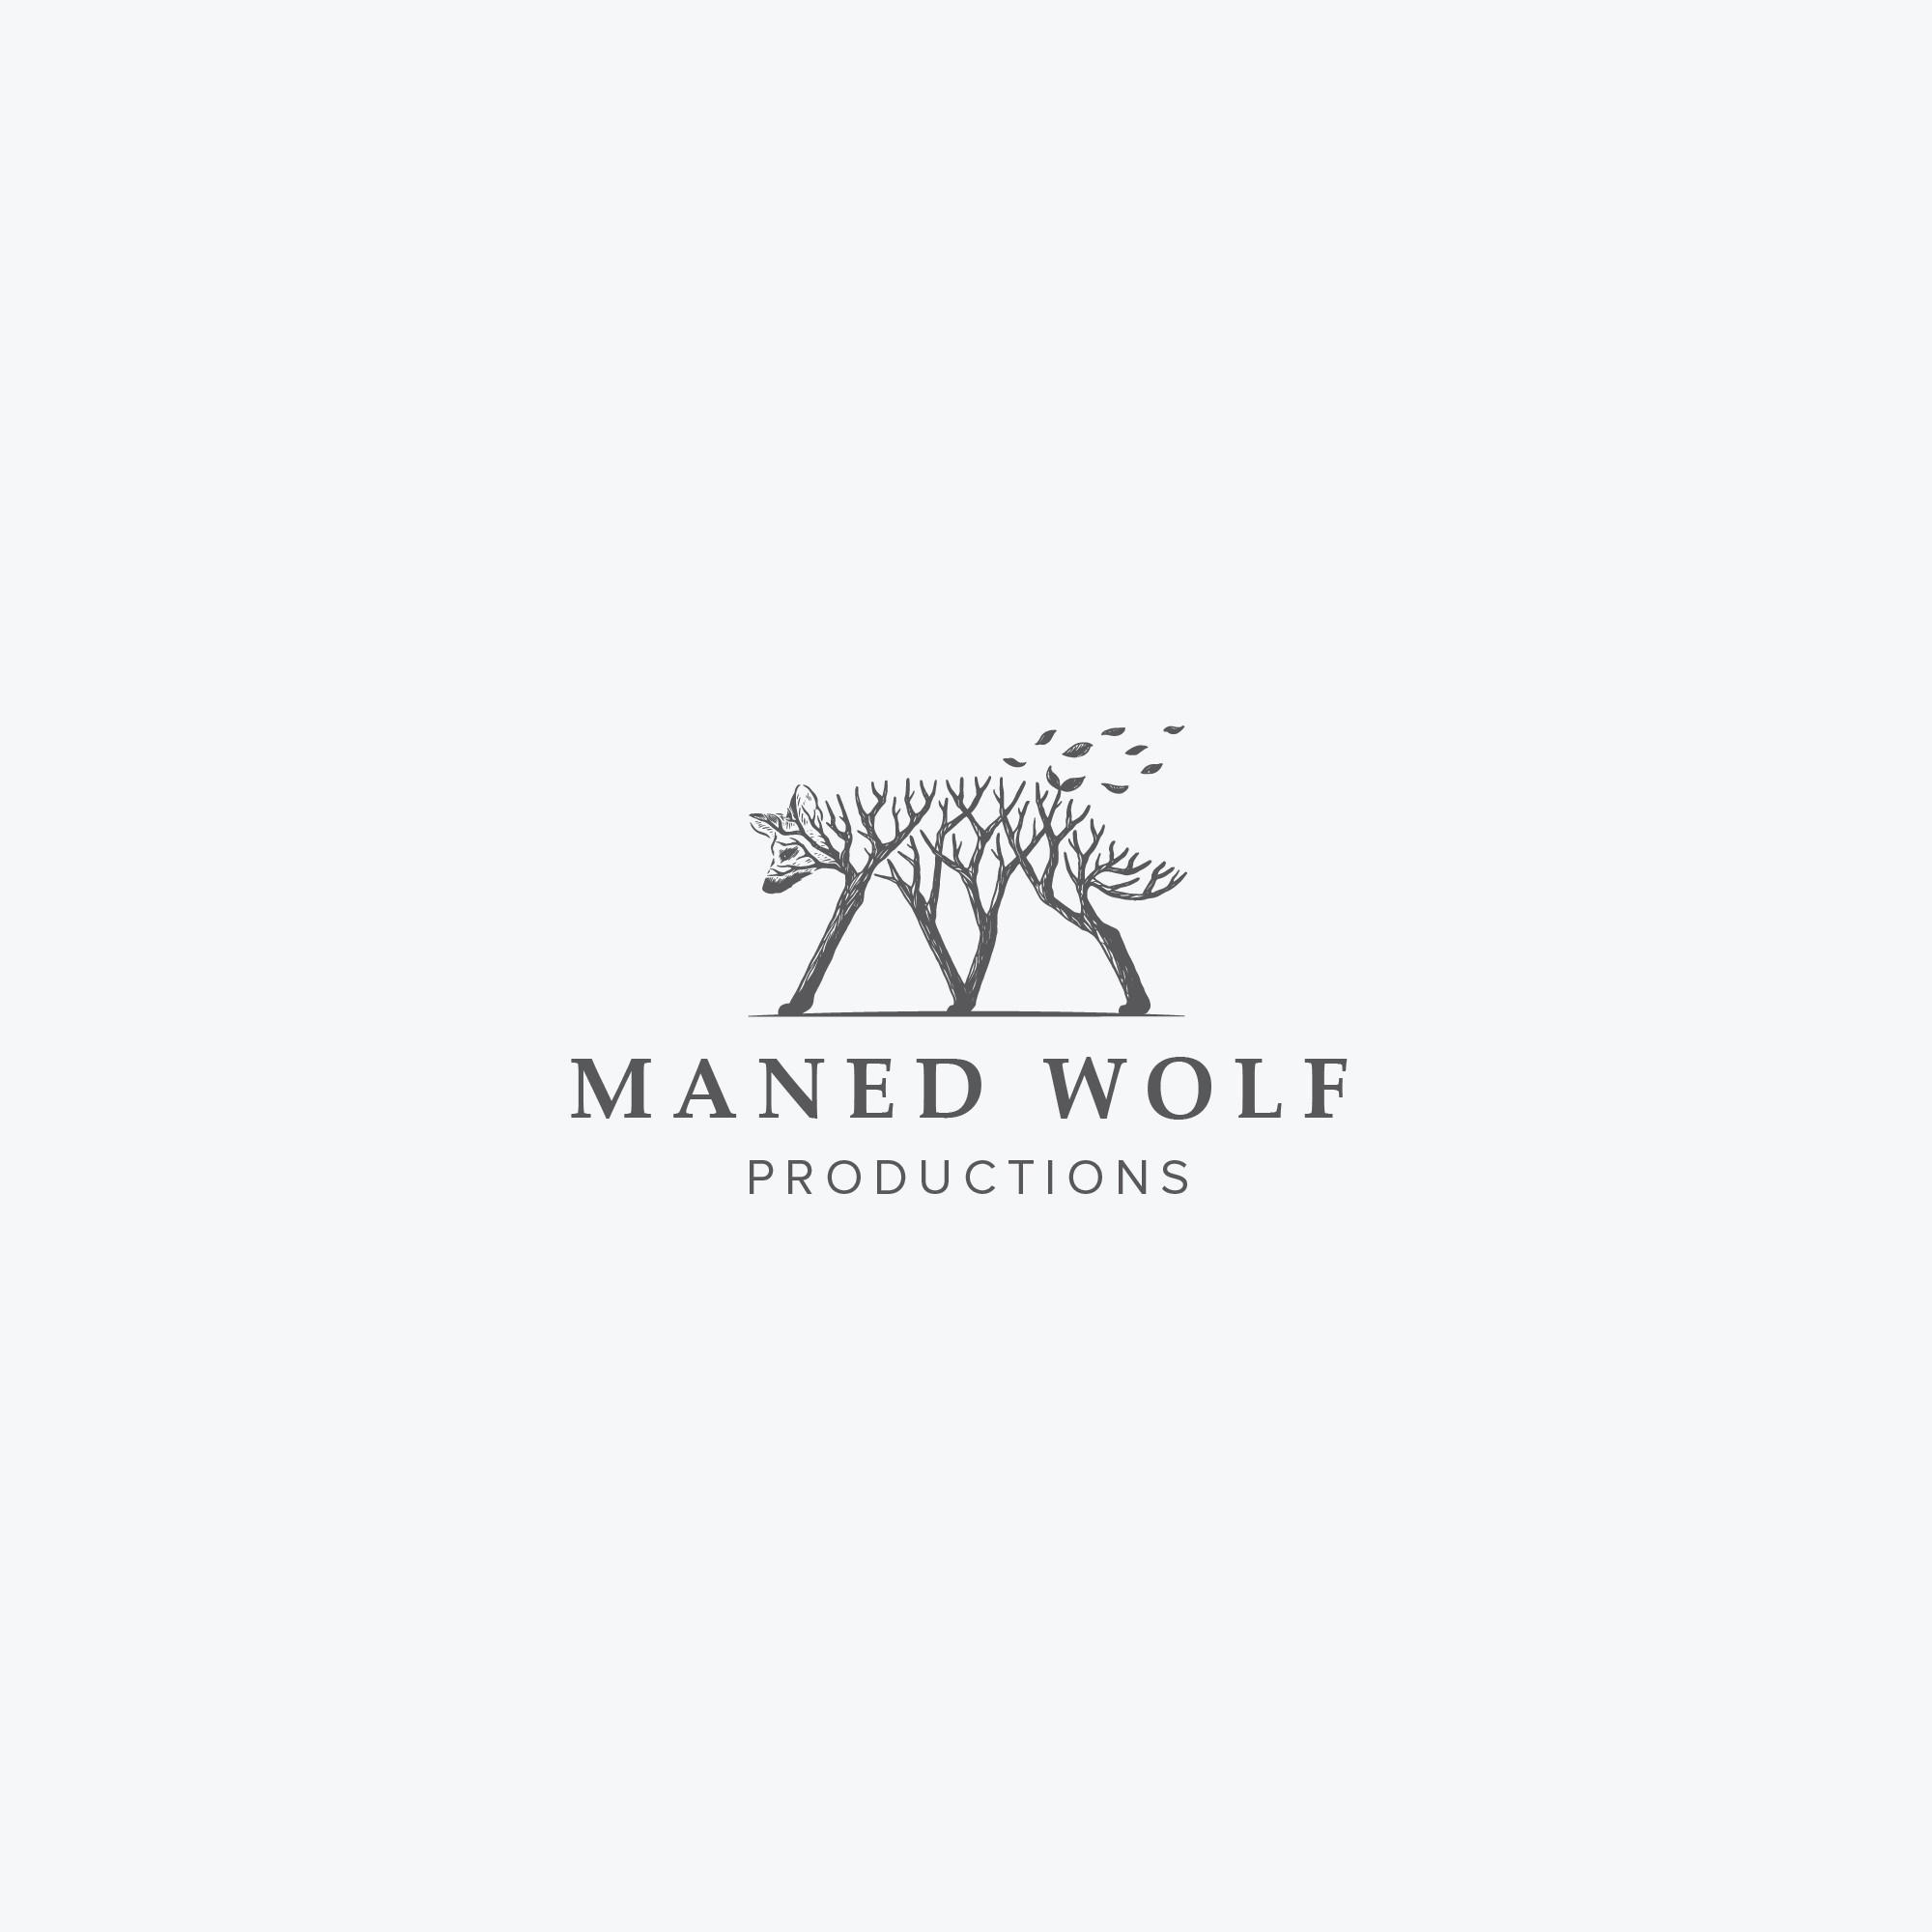 Film & Theatre Company Needs A New Creative Logo